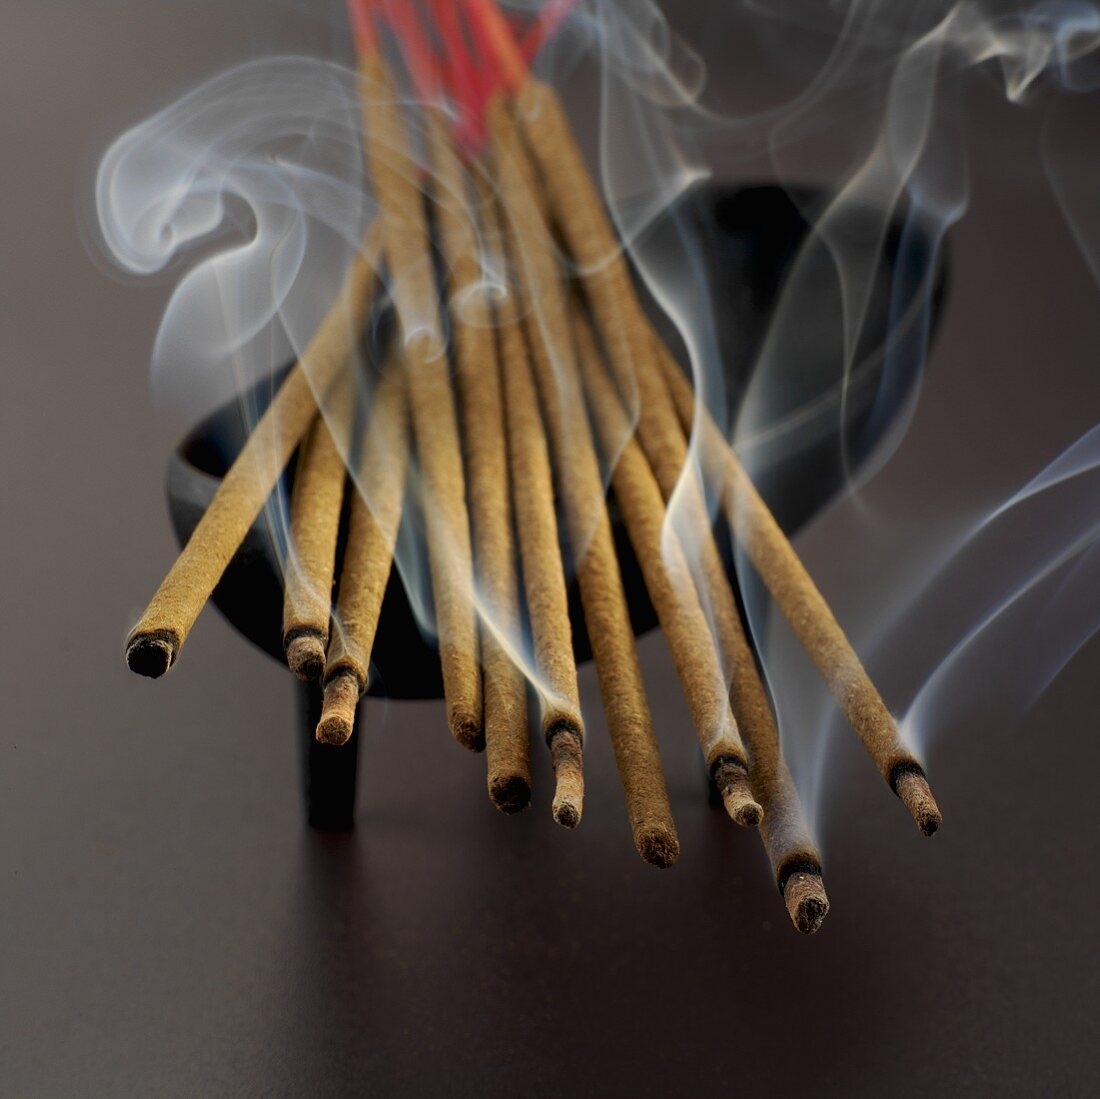 Incense sticks in dish